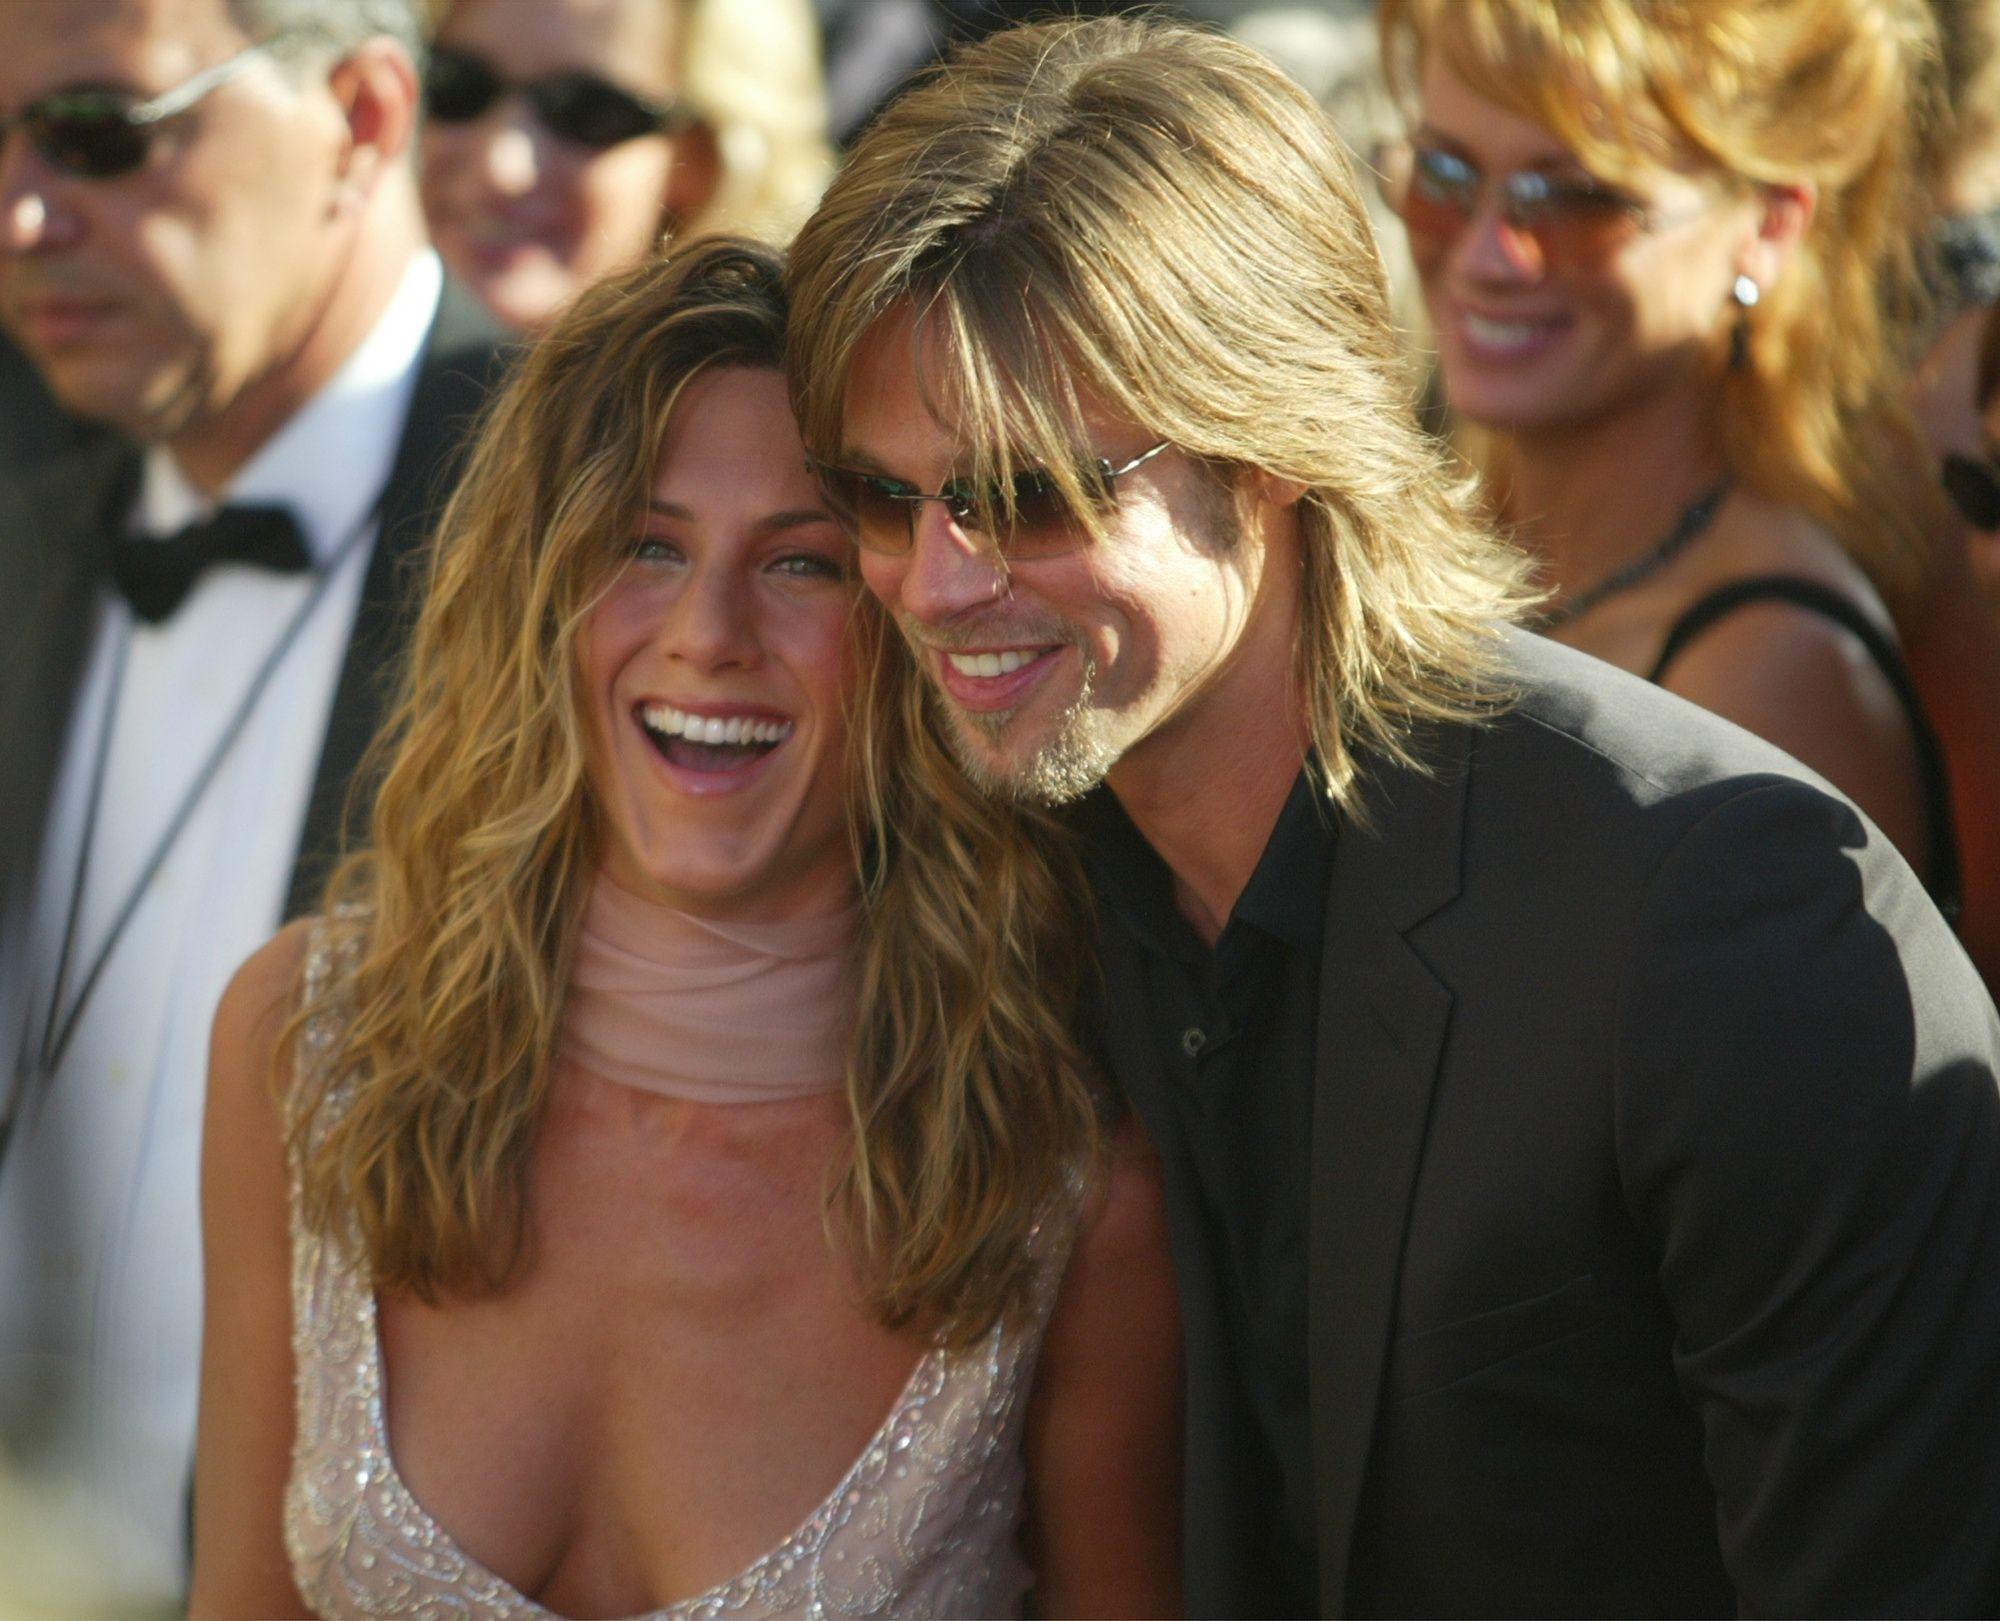 Sept. 22, 2002 - U.S. - KRT ENTERTAINMENT STORY SLUGGED: TV-EMMYS KRT PHOTOGRAPH BY MARK AVERY/ORANGE COUNTY REGISTER (September 22) LOS ANGELES, CA - Jennifer Aniston and Brad Pitt arrive at the 54th Annual Primetime Emmy Awards on Sunday, September 22, 2002, in Los Angeles, California. (OC) NC KD BL 2002 (Horiz) (Digital image) (mvw),Image: 193640586, License: Rights-managed, Restrictions: , Model Release: no, Credit line: Orange County Register / Zuma Press / Profimedia